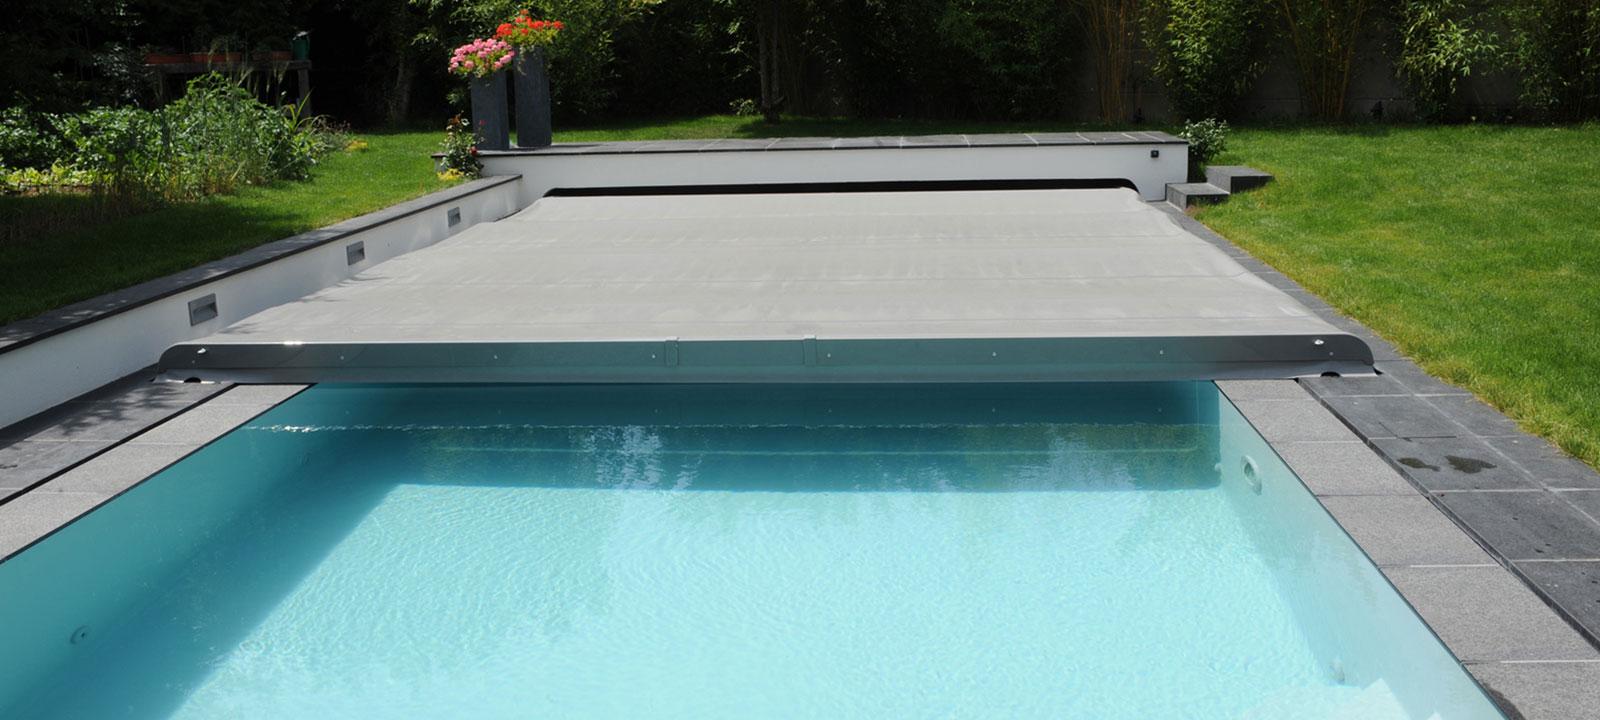 bache piscine 8m x 4m